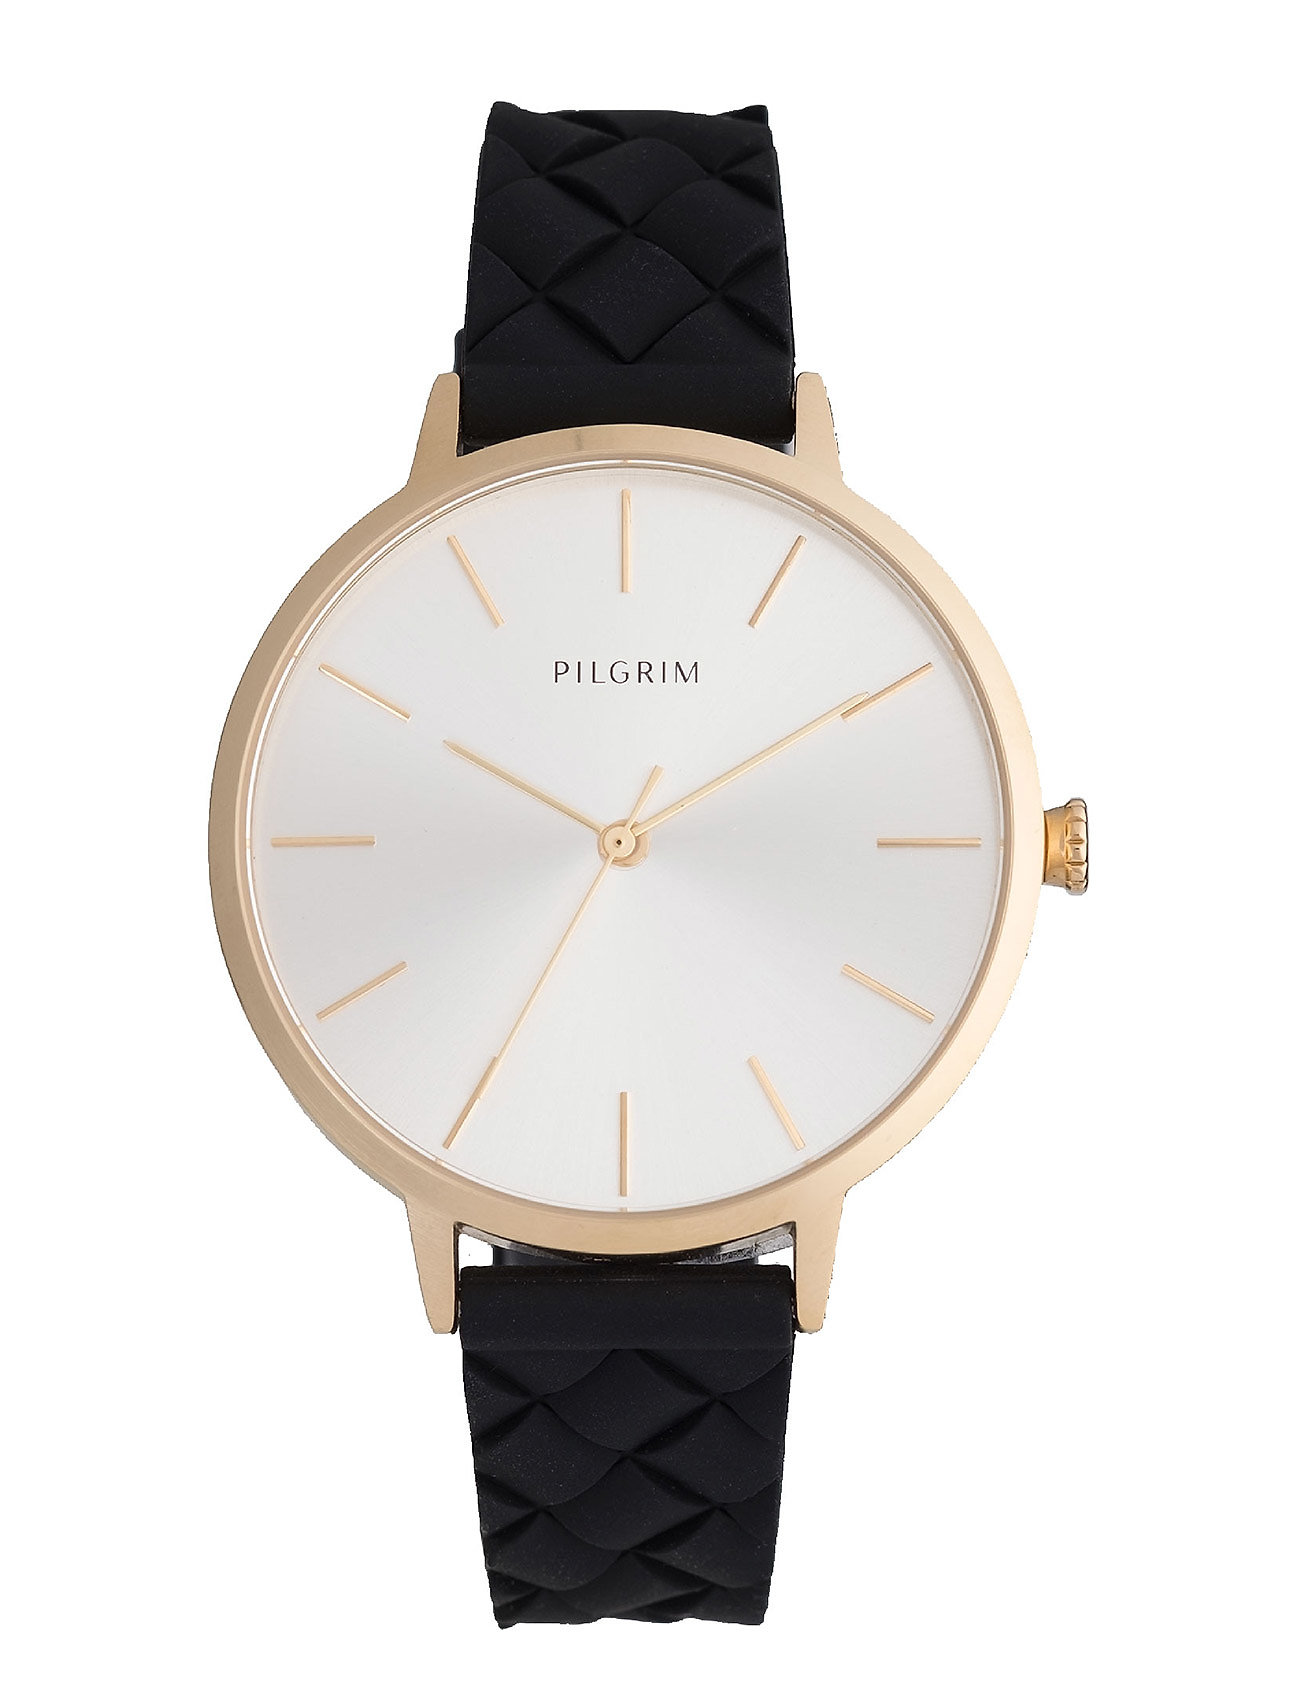 Pilgrim Watch Klocka Guld Pilgrim